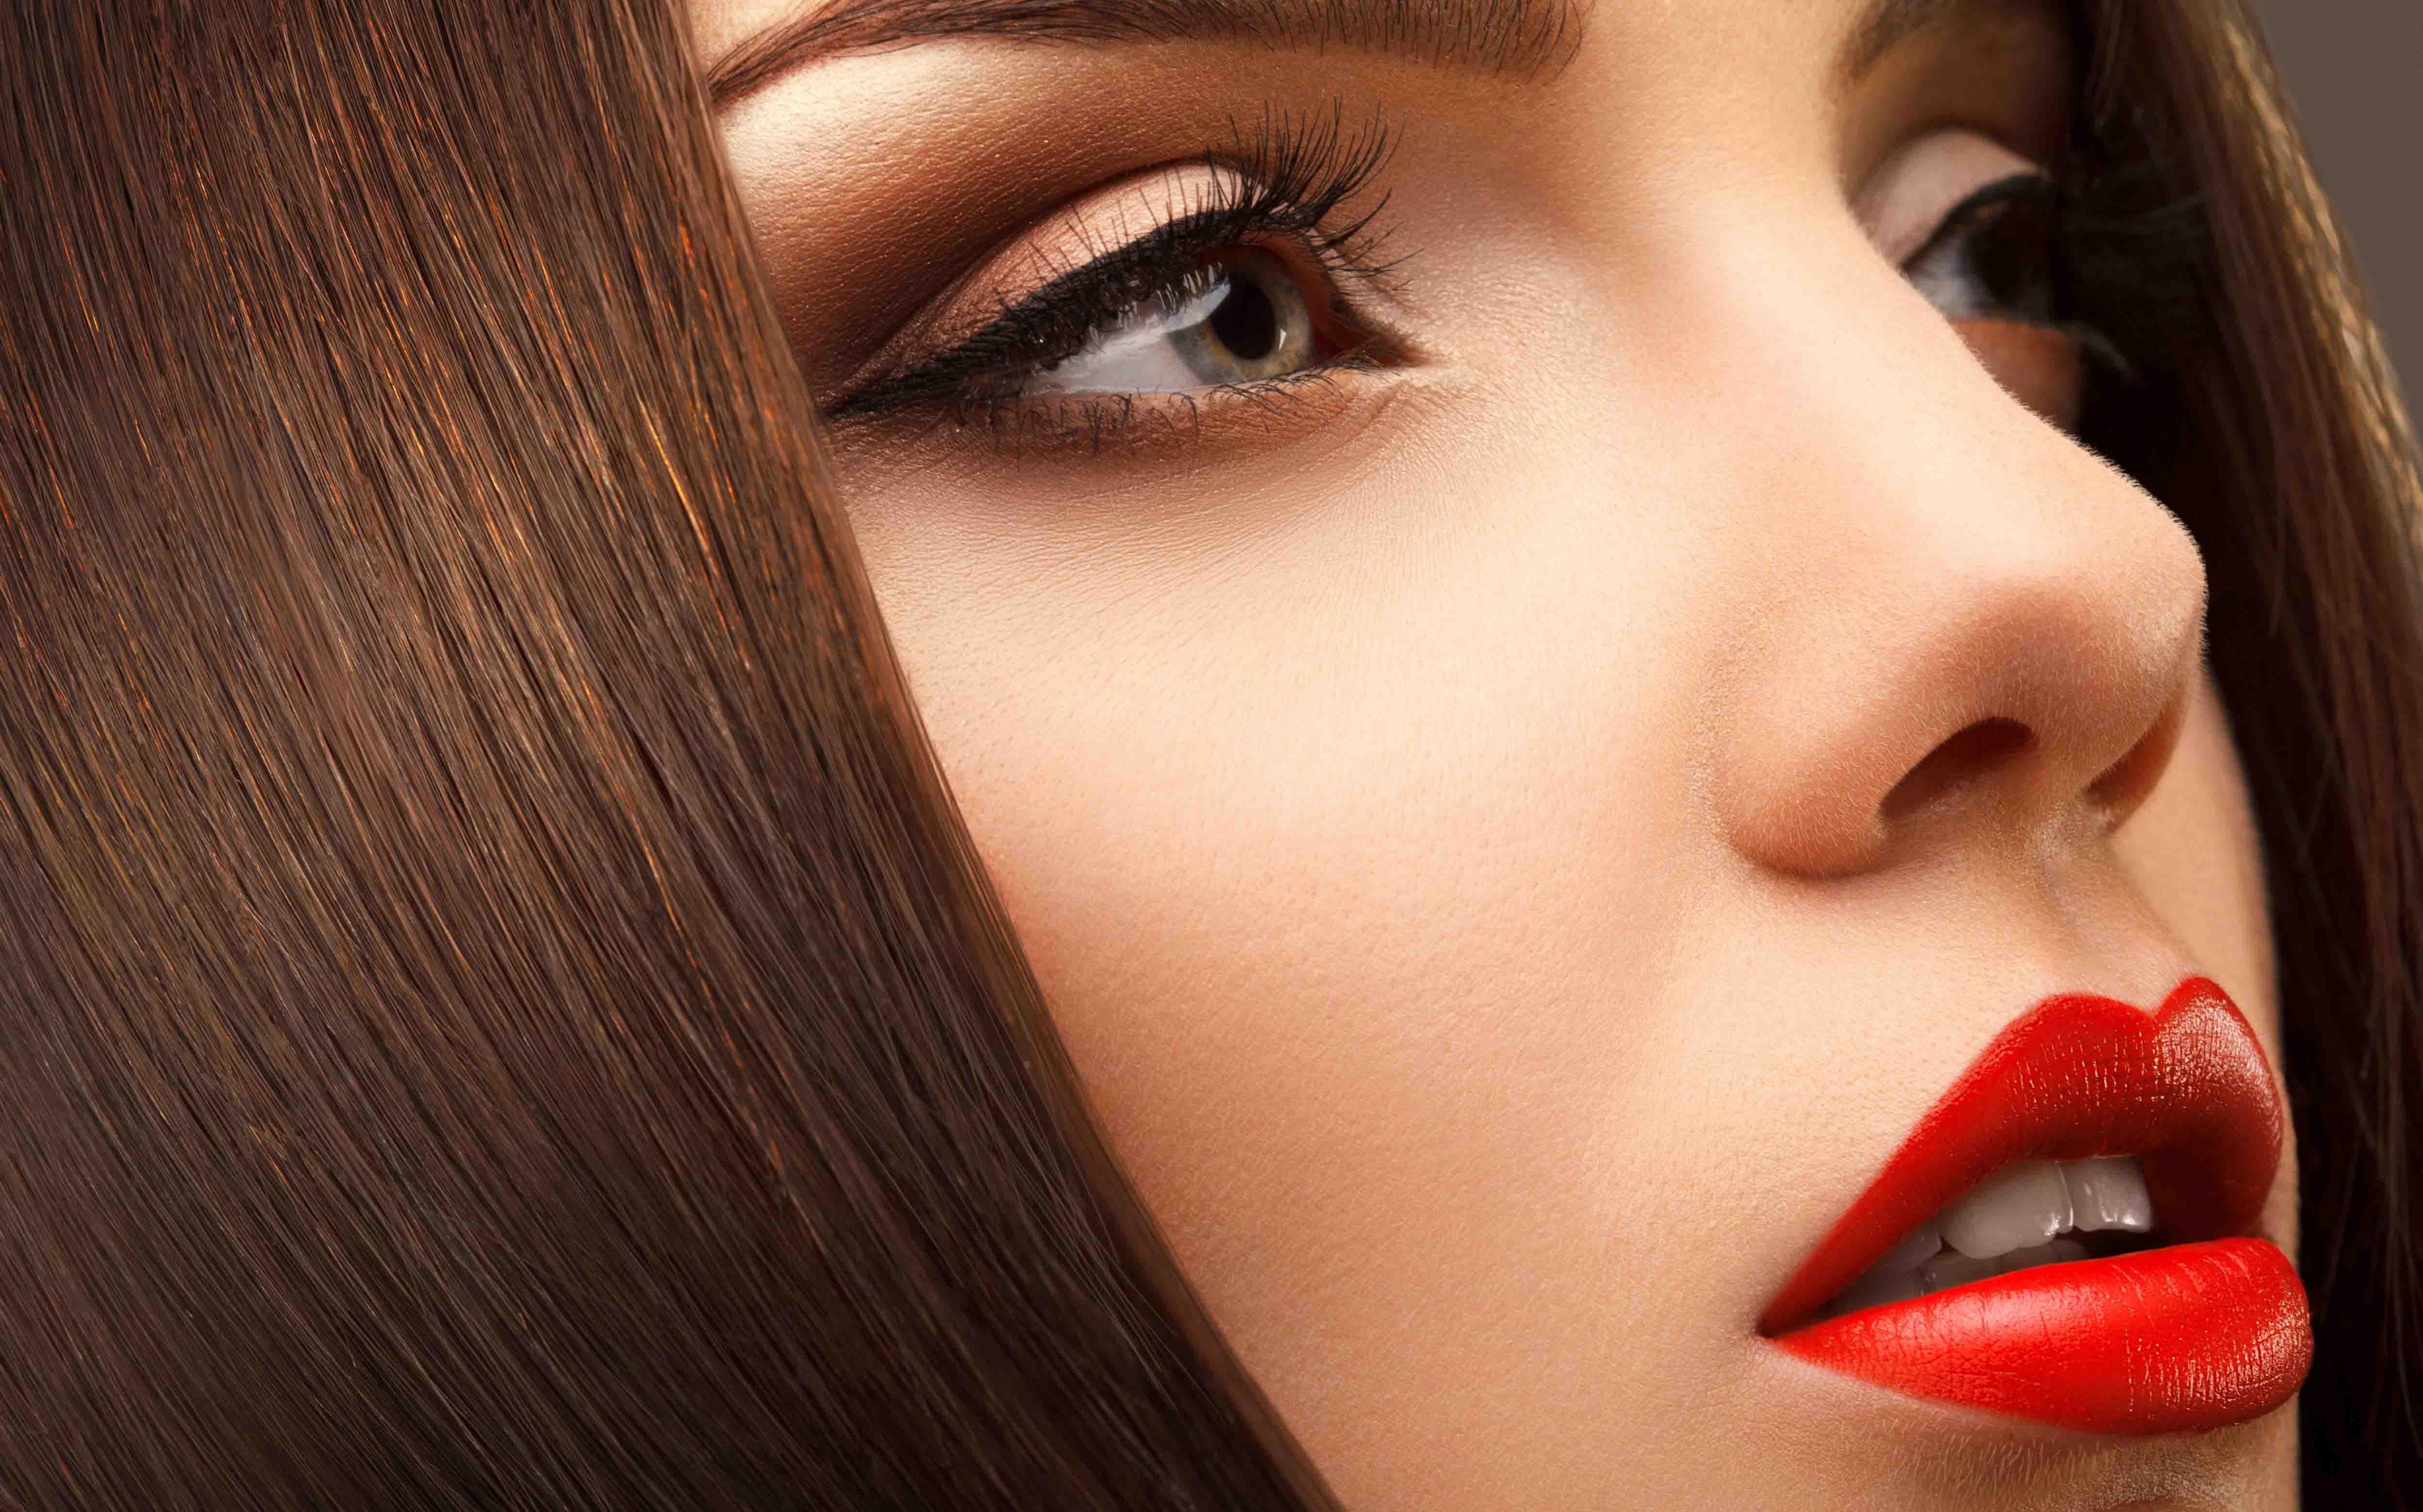 tendenze-trucco-labbra-zephir-parrucchieri-ascona-muralto.jpg